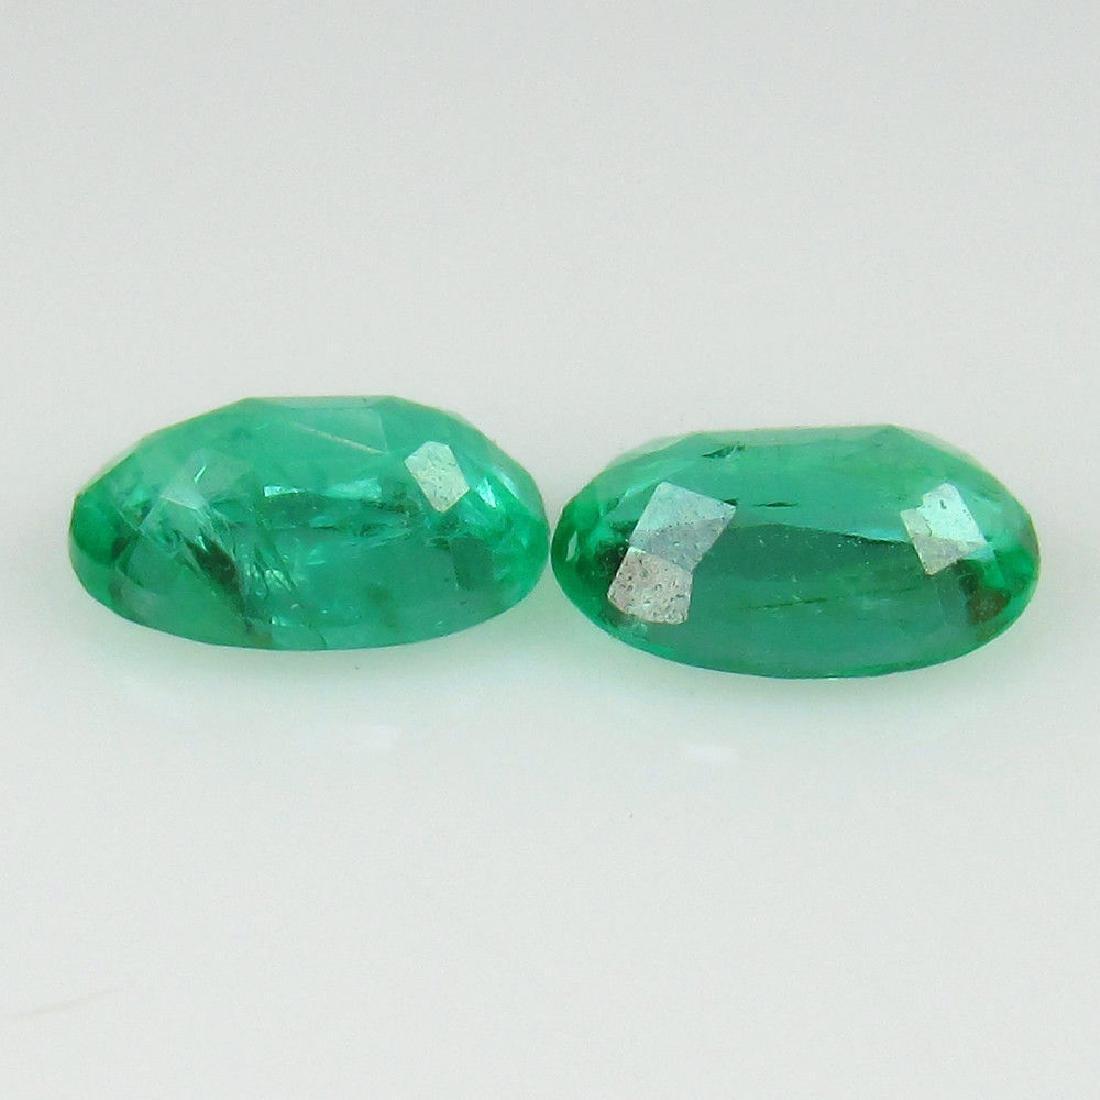 0.83 Carat Natural Zambian Emerald Oval Pair - 2